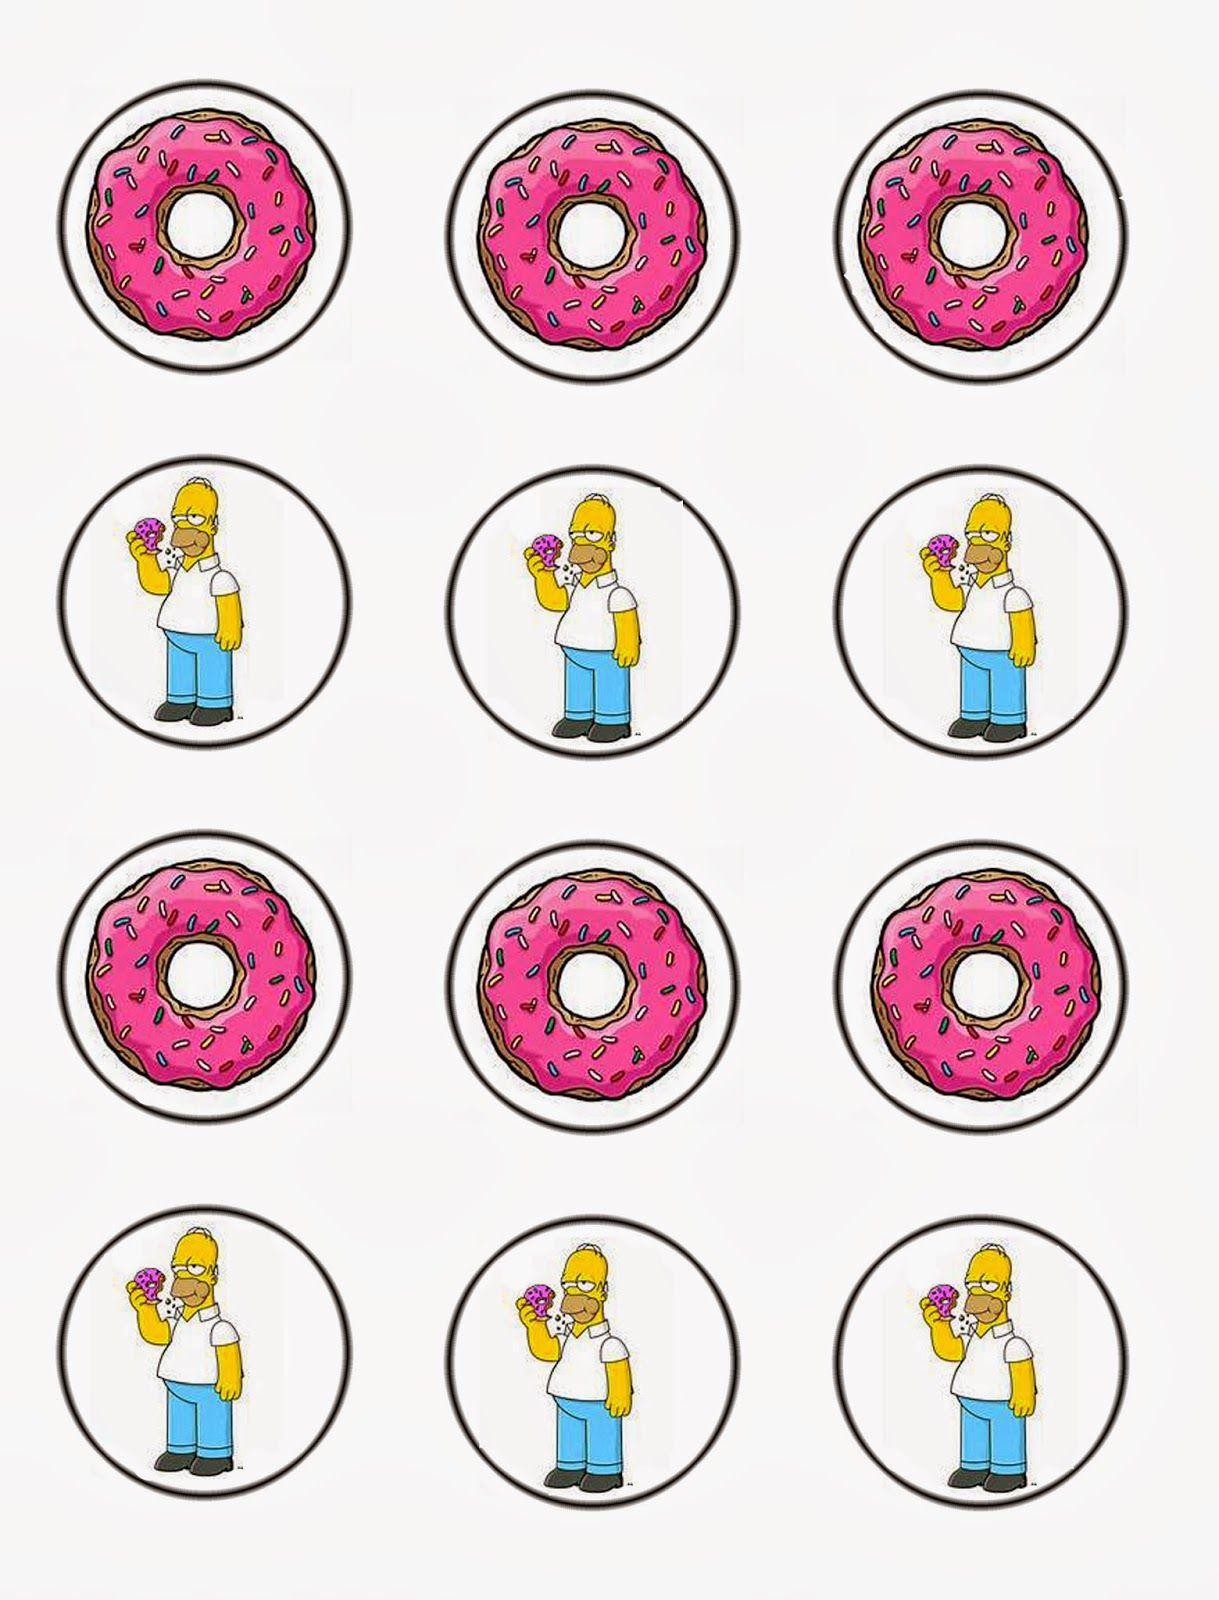 Daisy Celebrates Free The Simpsons Cupcake Toppers Download Simpsons Party The Simpsons Free Printable Invitations